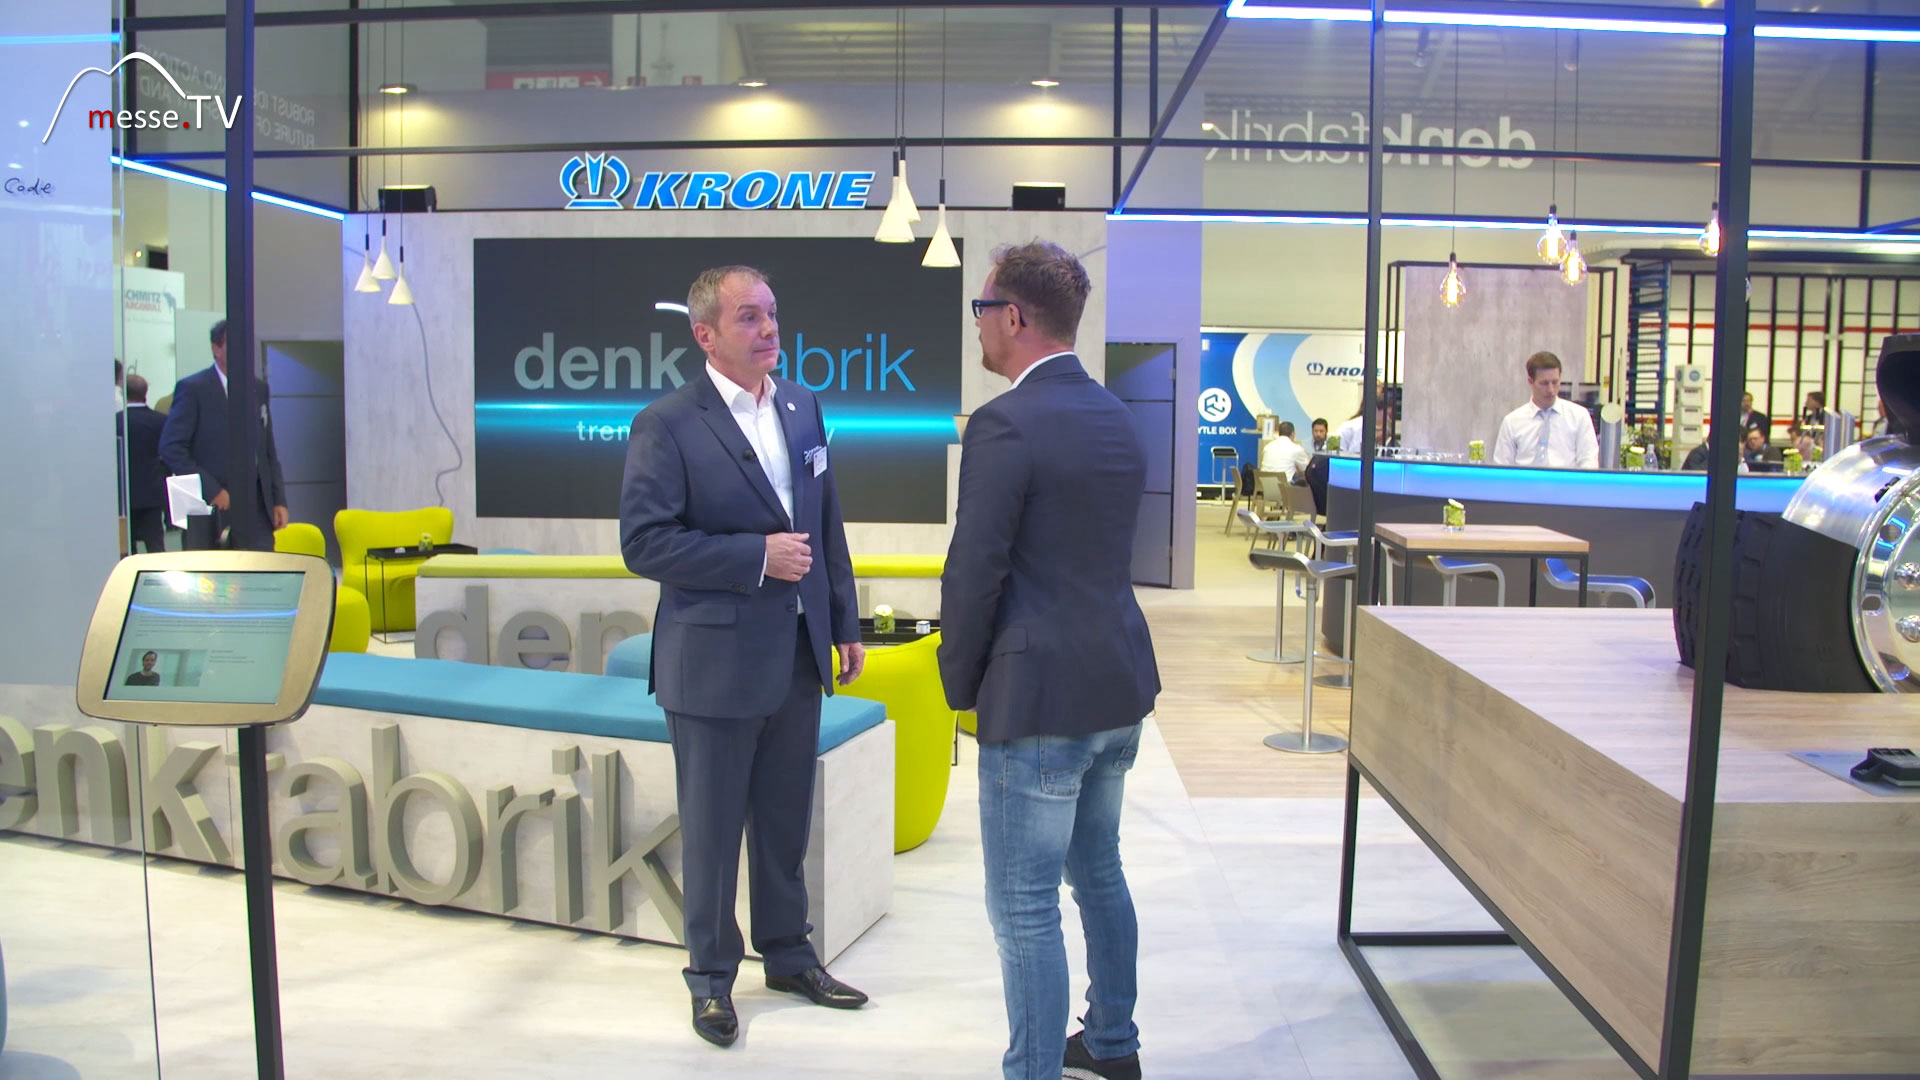 KRONE Interview Denkfabrik trends in mobility Messe München